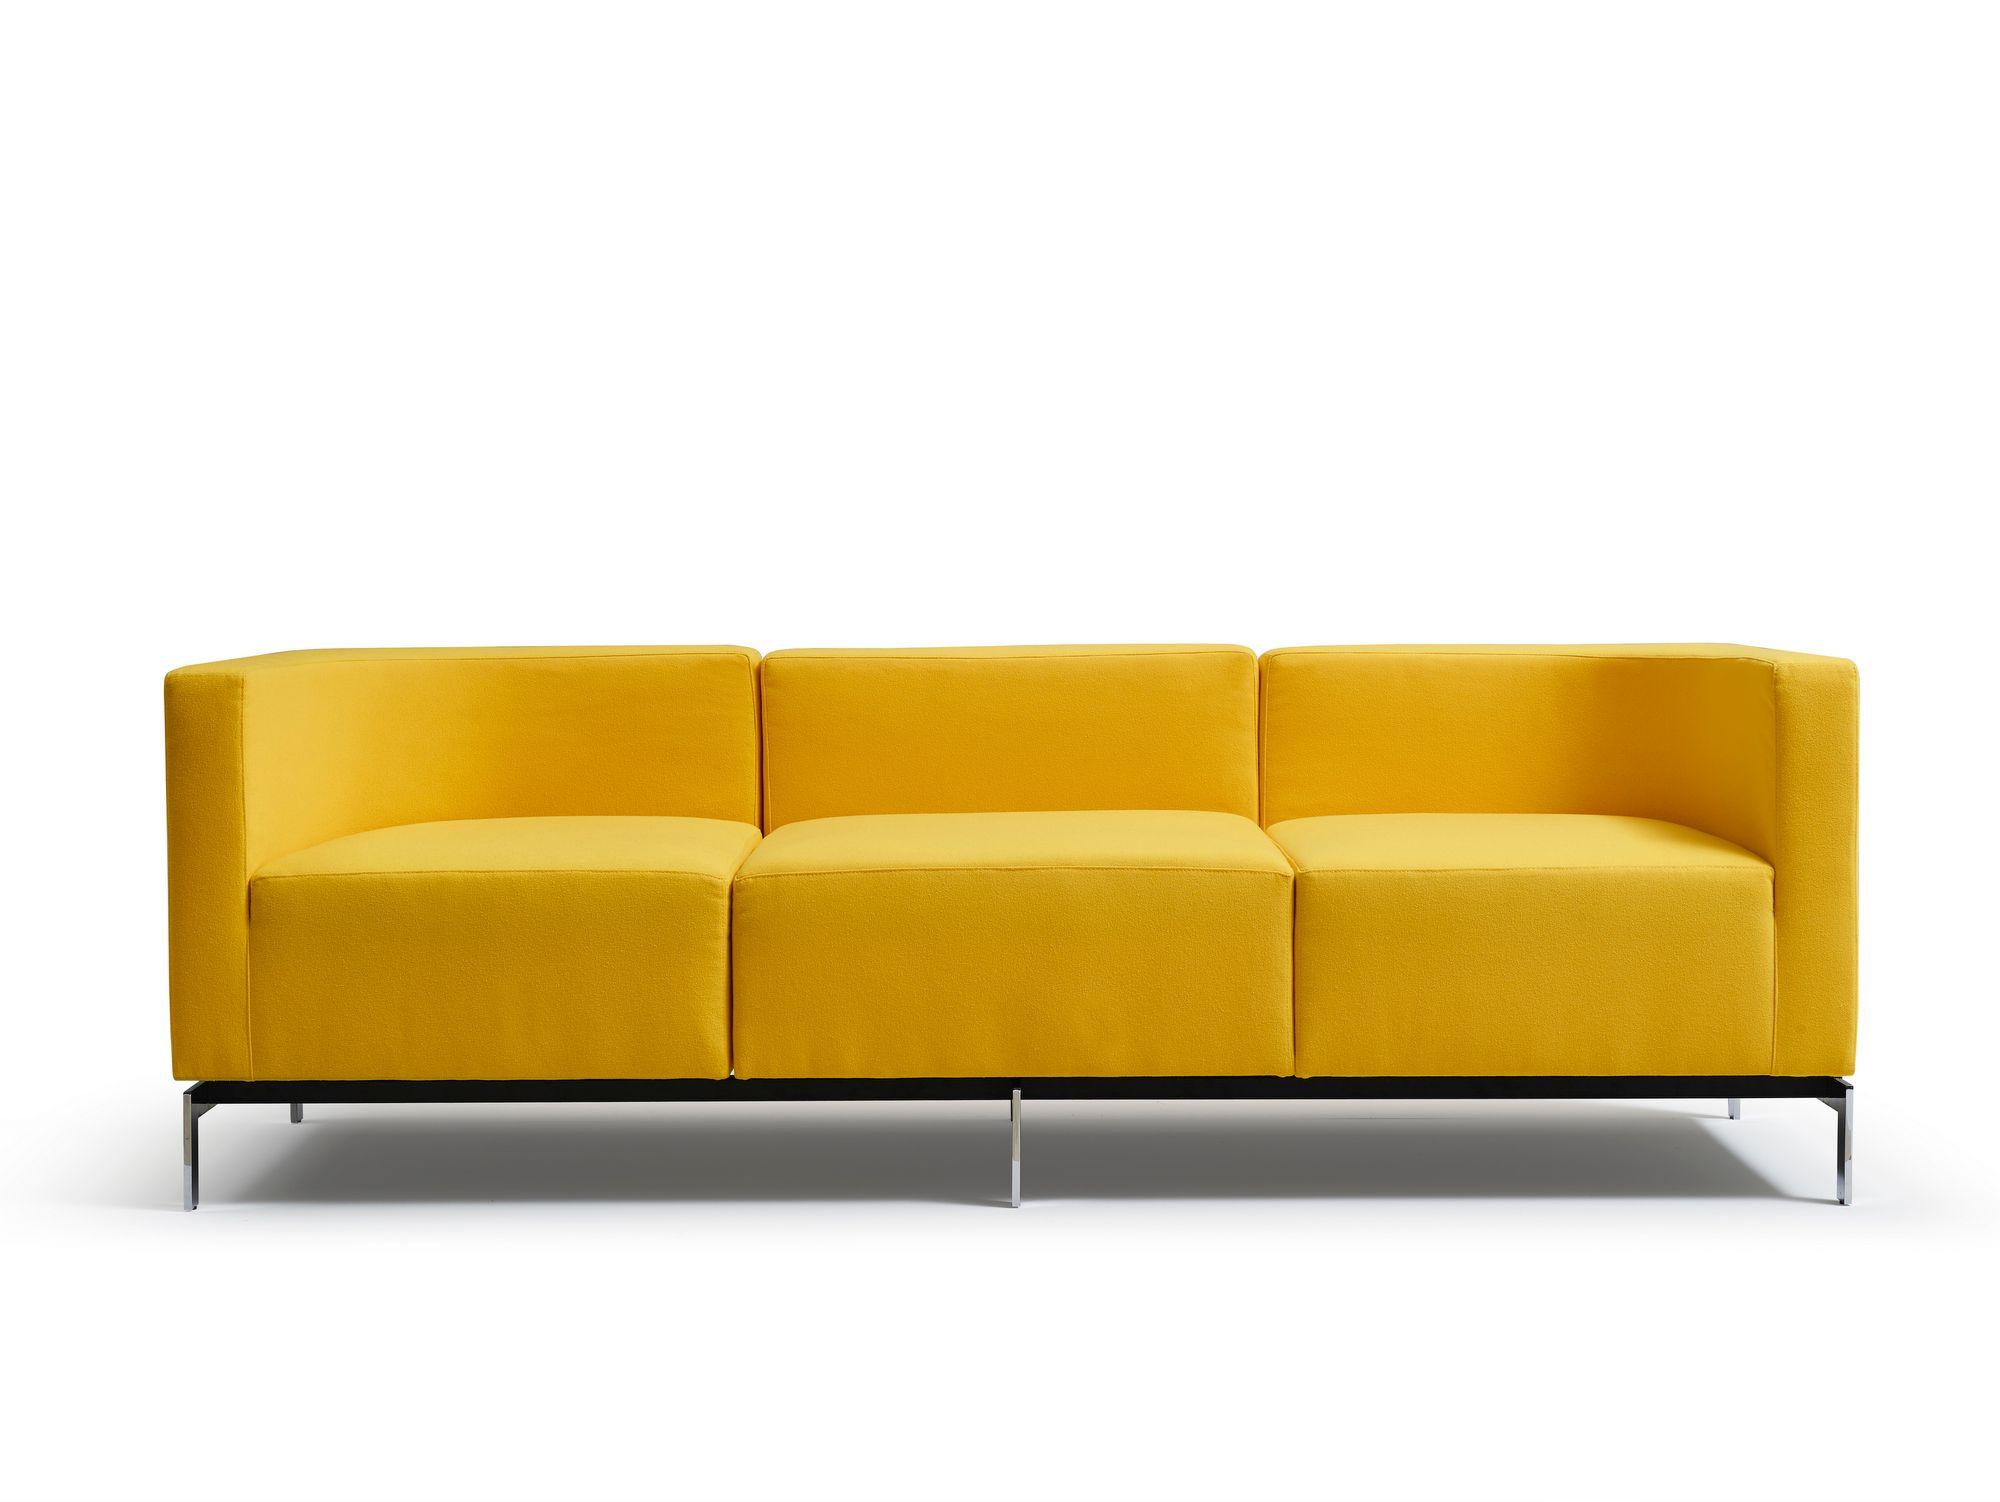 Sectional fabric leisure sofa MEGA By Quinti Sedute design